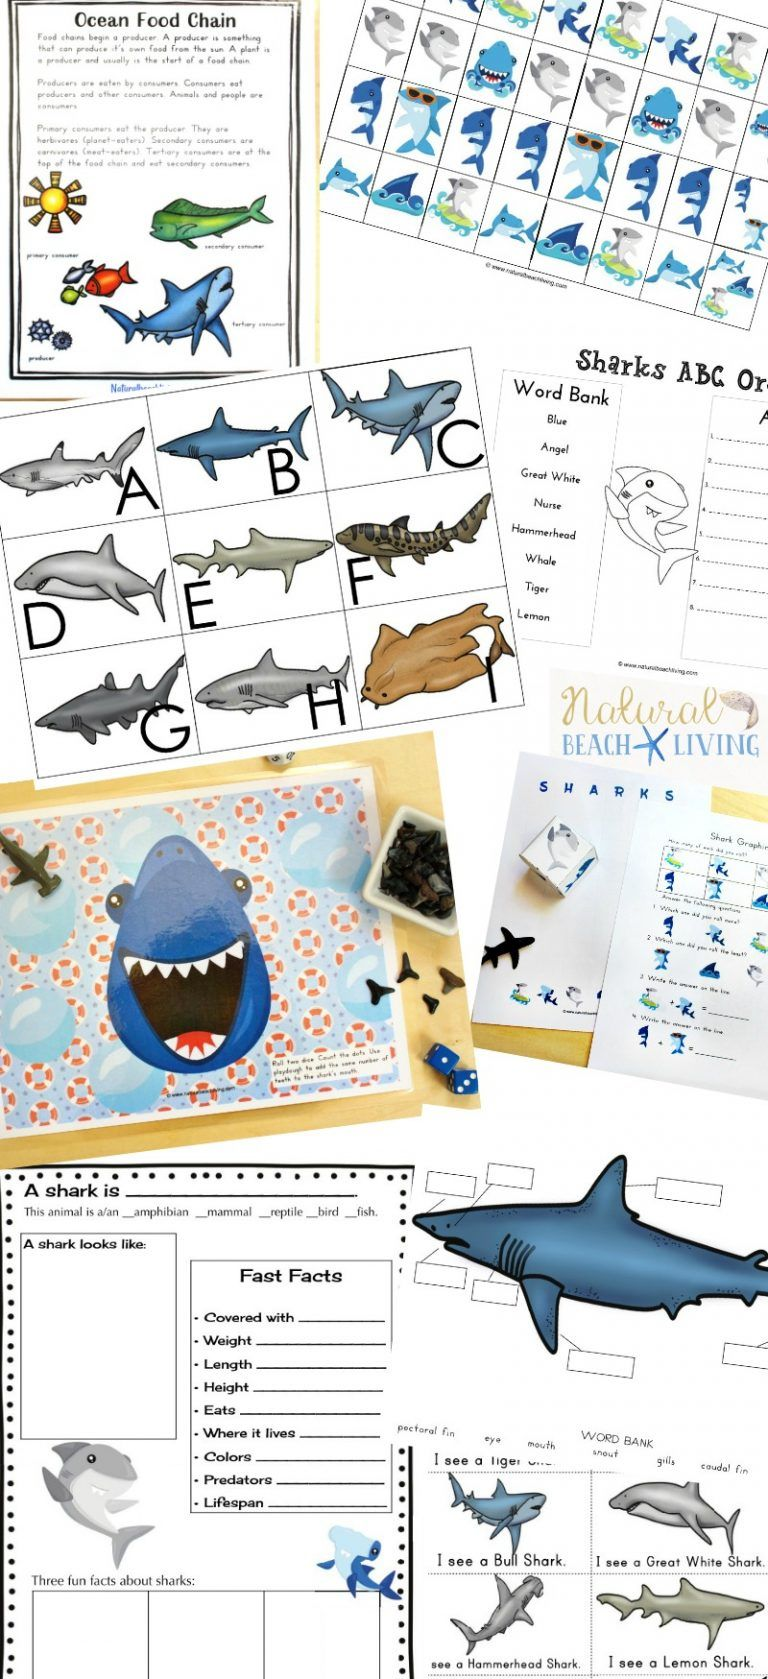 The Best Shark Printable Activities For Kids Shark Lesson Plans Natural Beach Living Shark Activities Printable Activities For Kids Science Activities For Kids [ 1679 x 768 Pixel ]